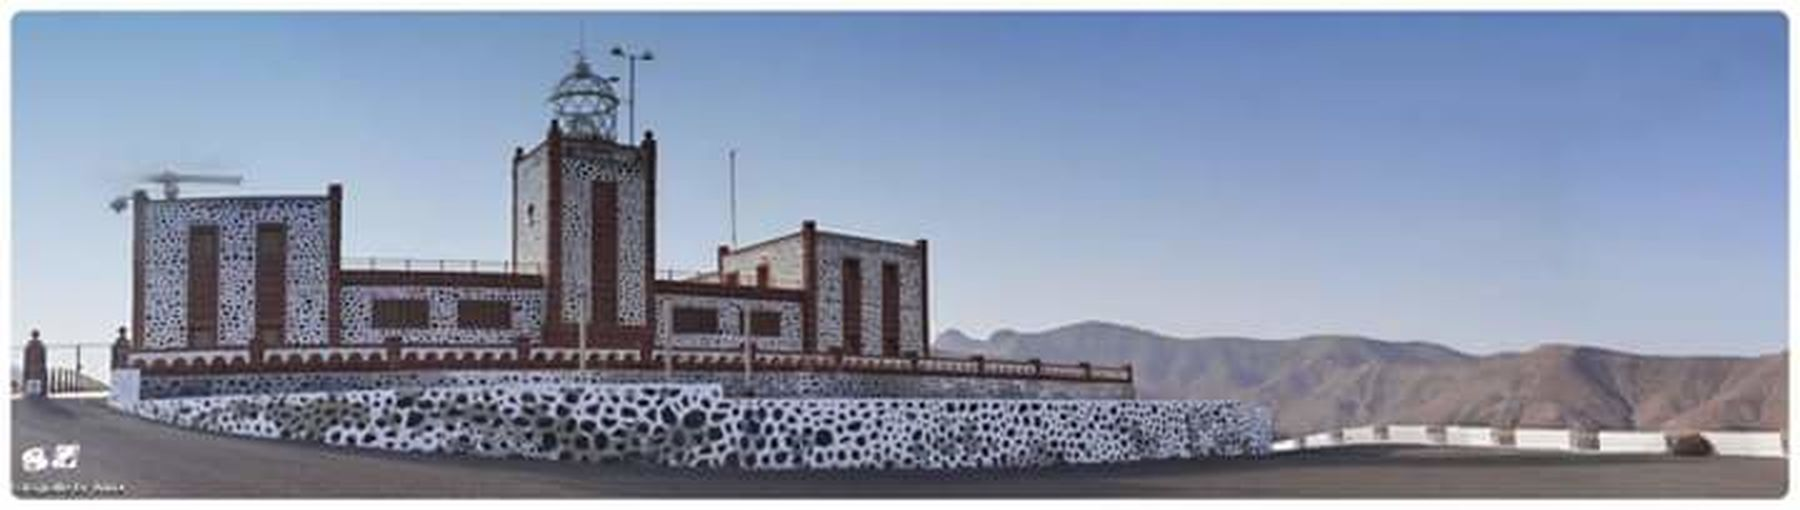 Fuerteventura Canary Islands Faro Las Playitas Archtitecture Faro De Entallada Lighthouse Tuineje